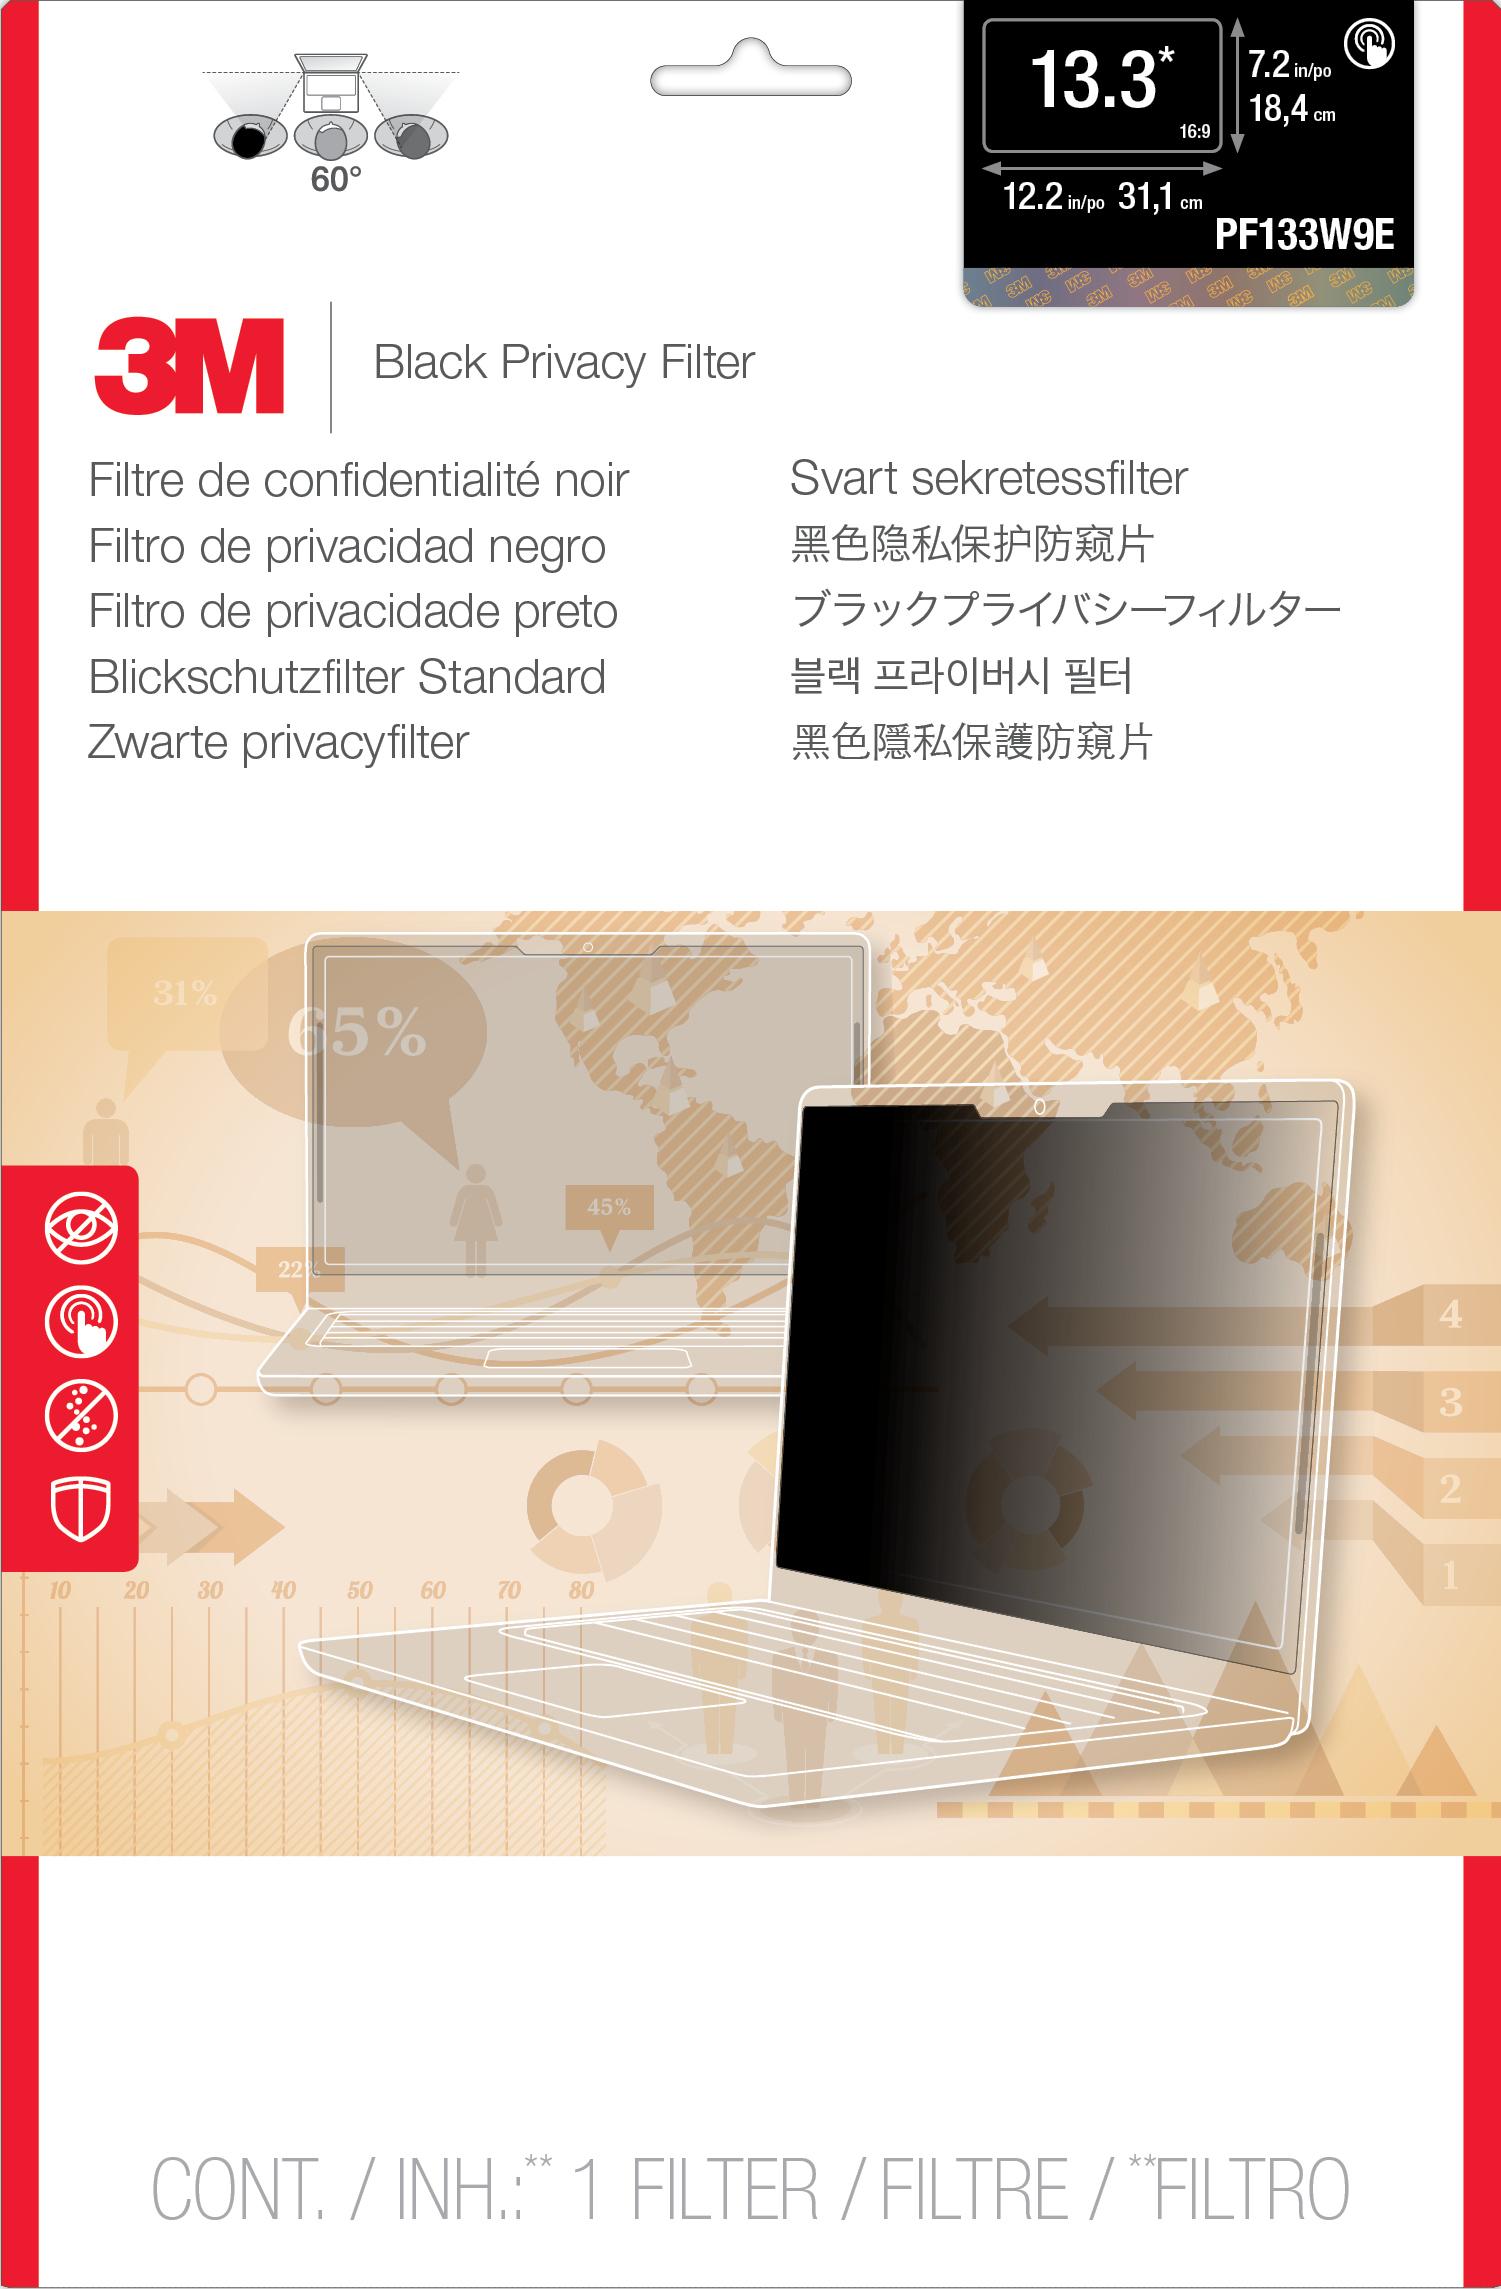 3M PF133W9E TouchLaptop Privacy Filter 16:9 schwarz